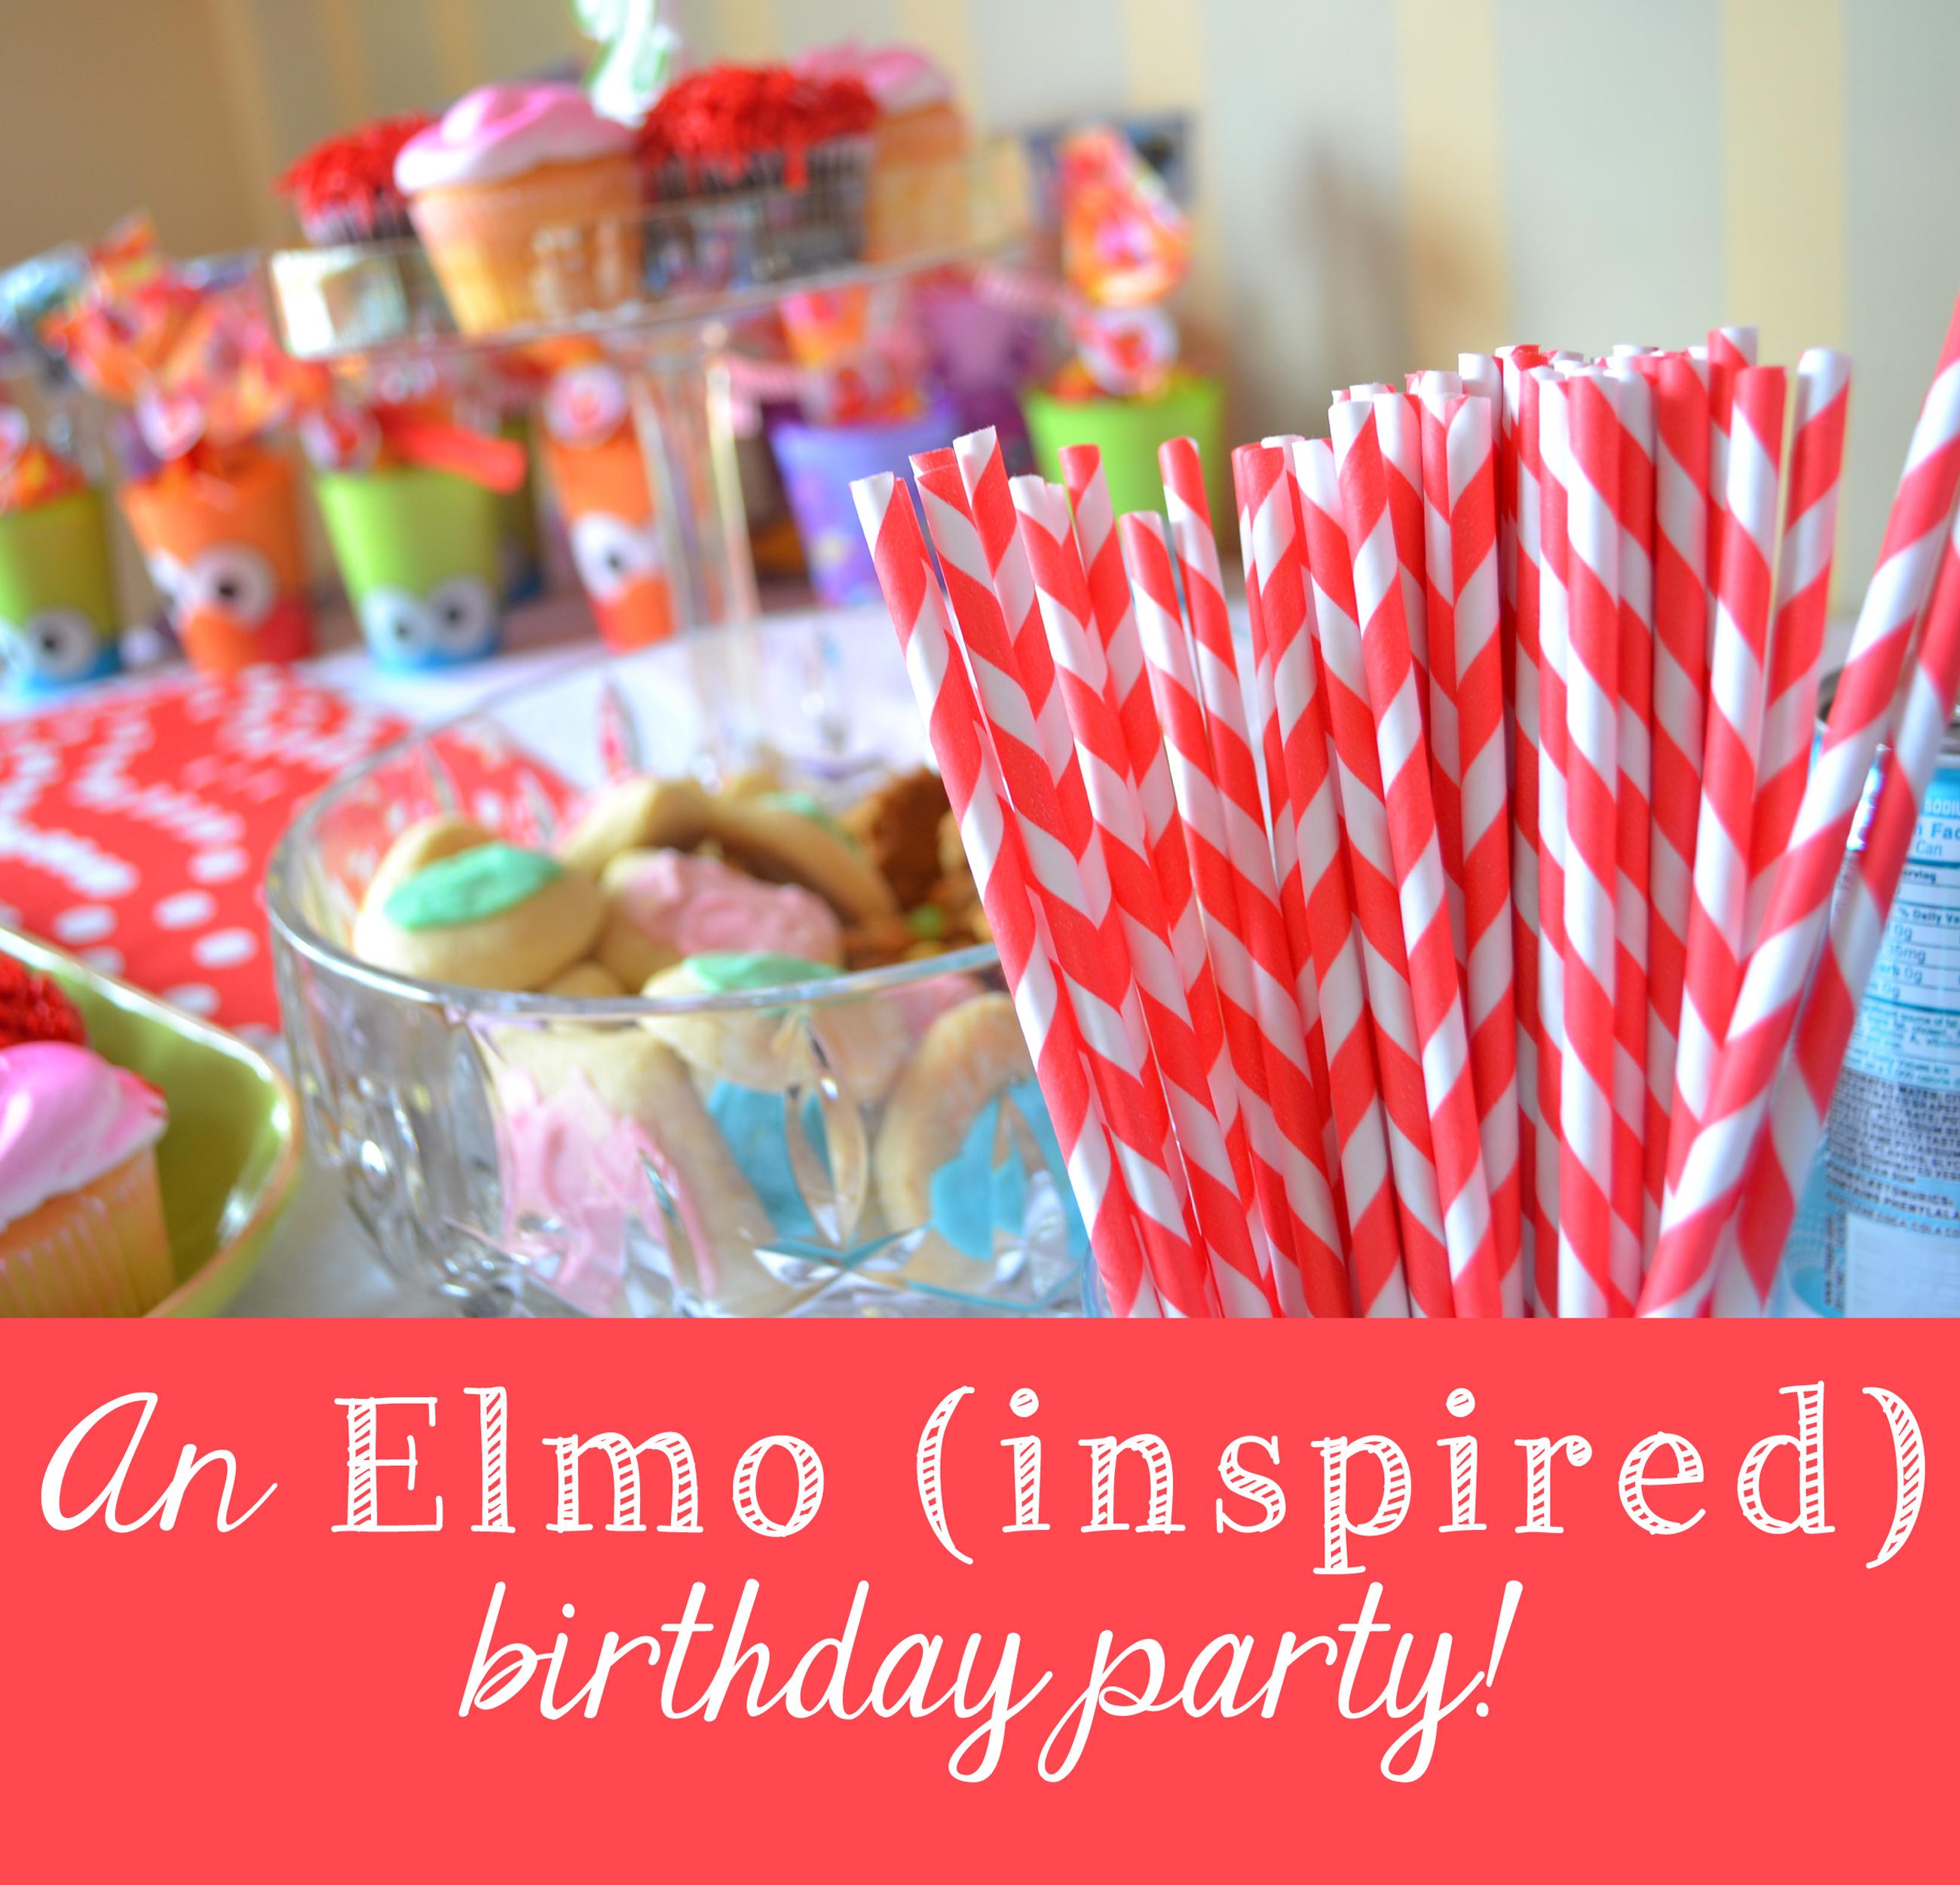 an elmo-ish birthday celebration